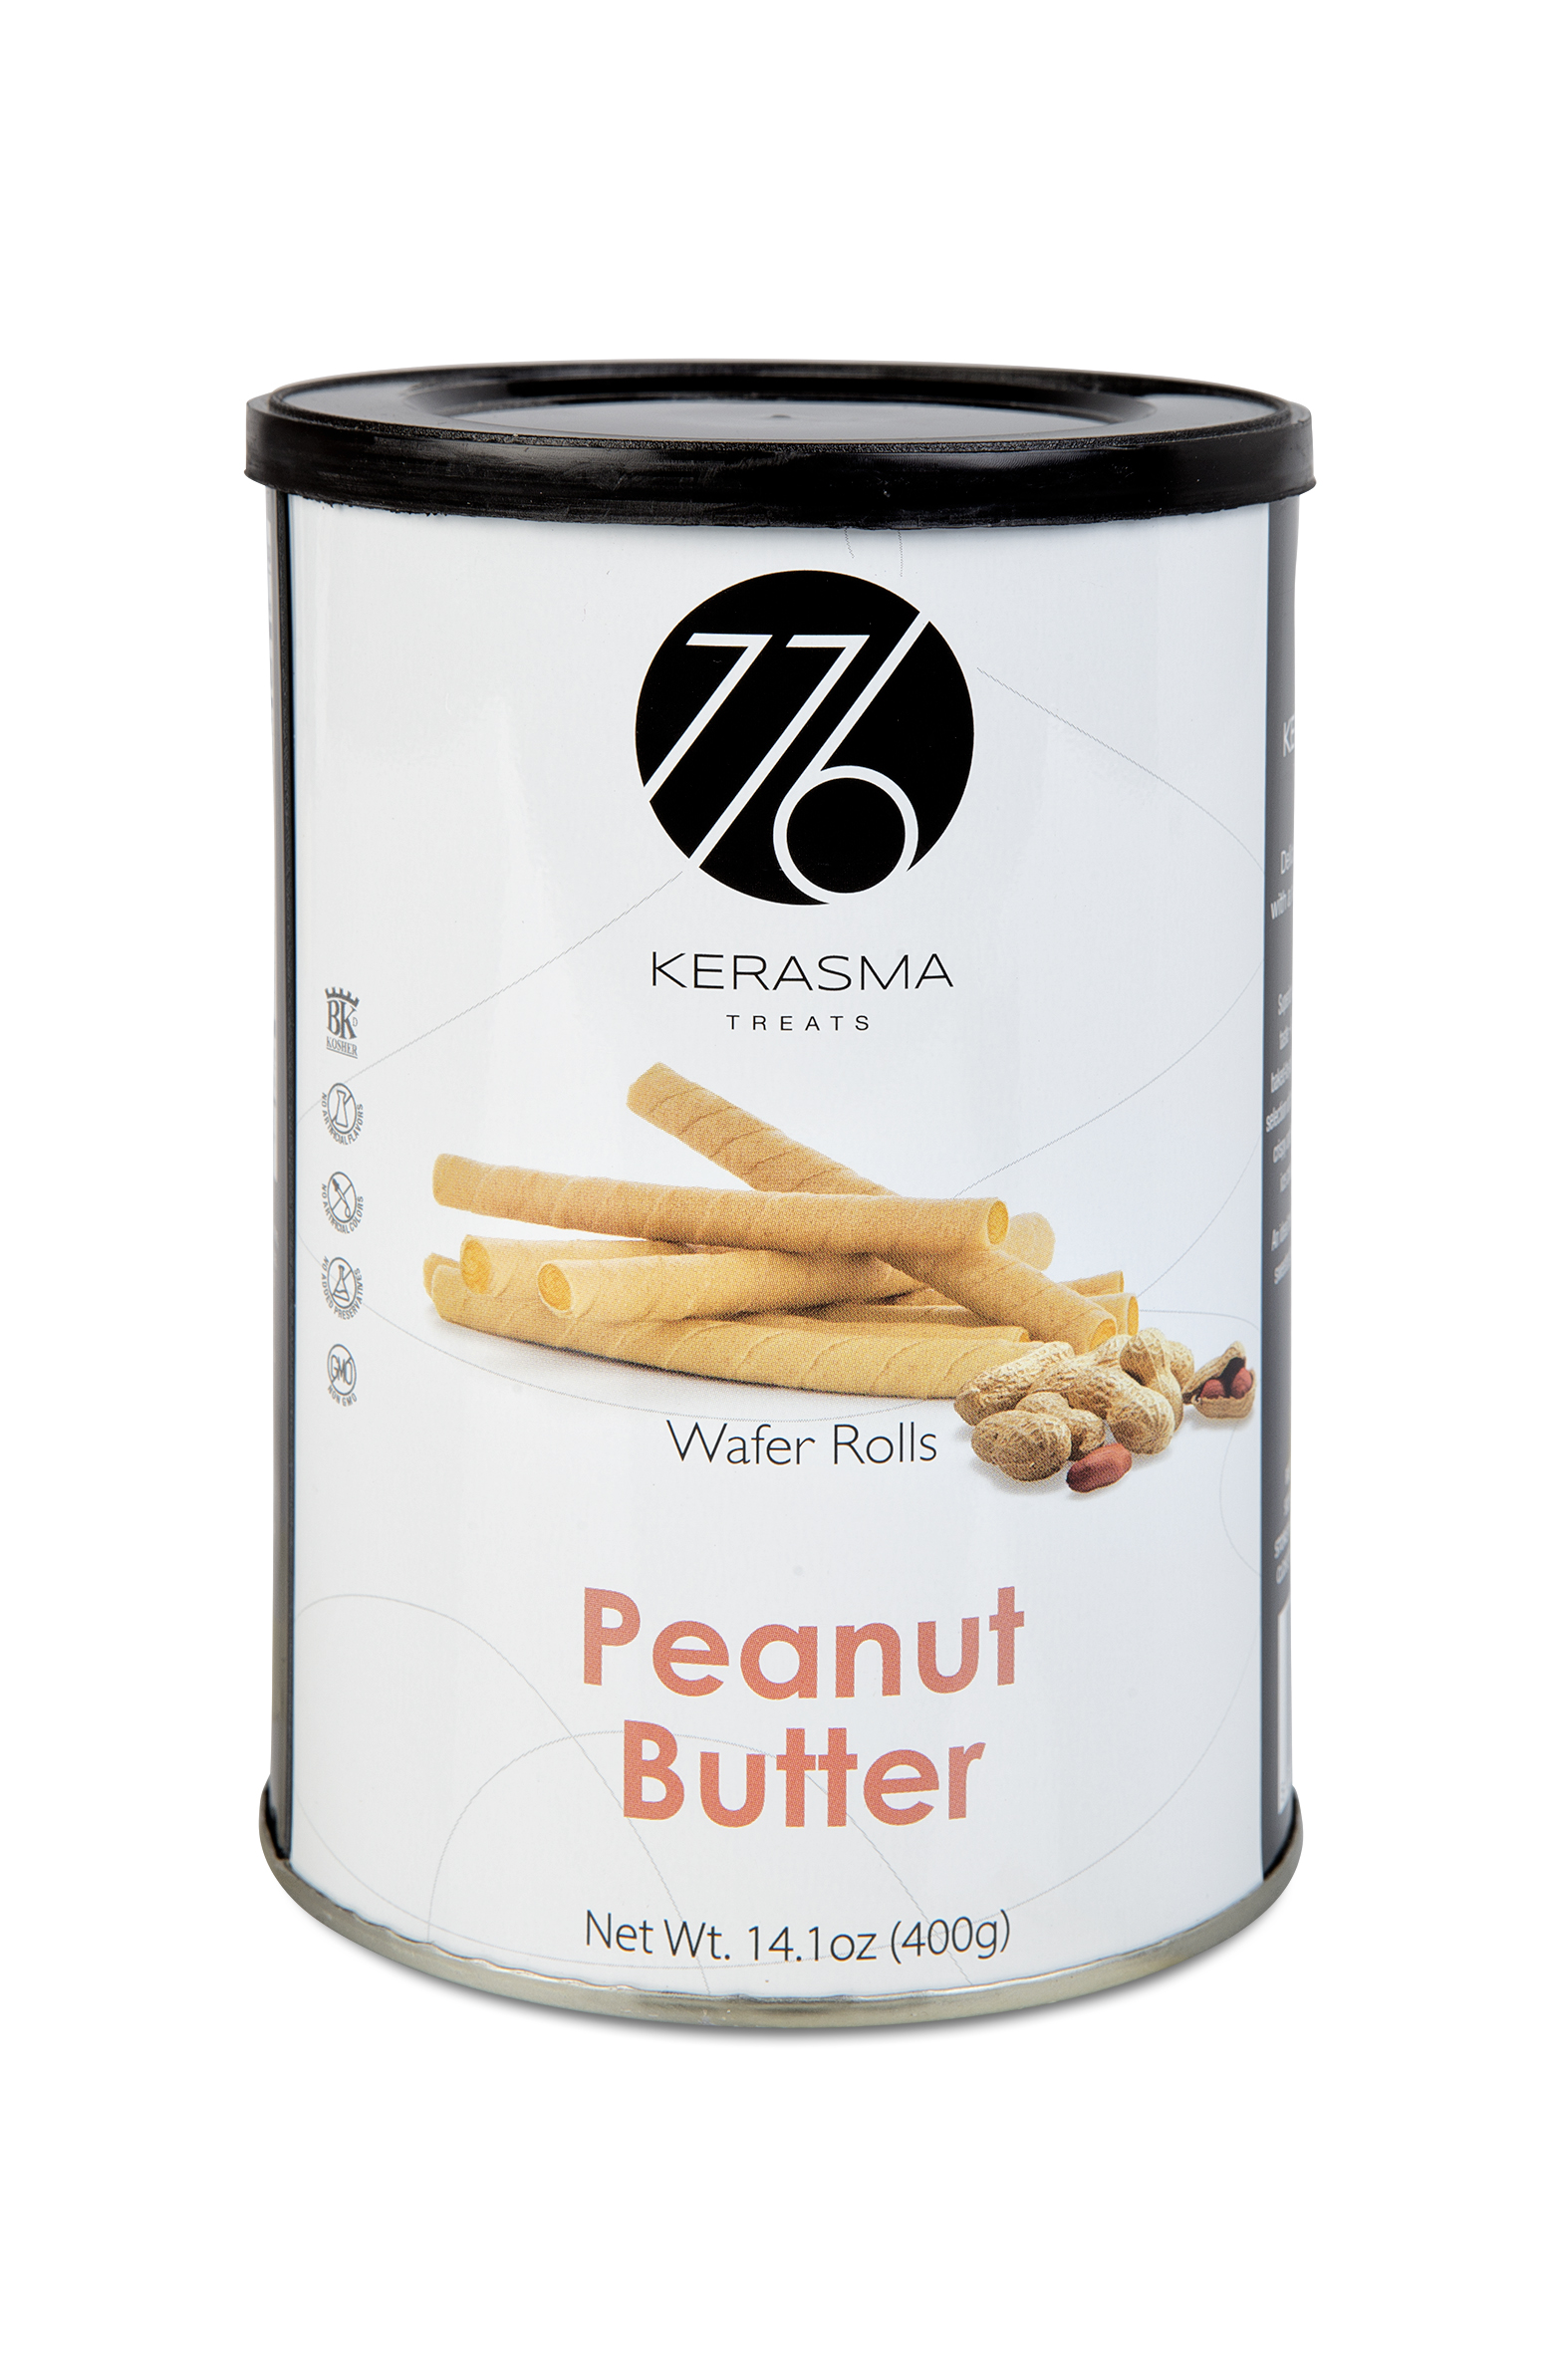 Peanut Butter Wafer Rolls